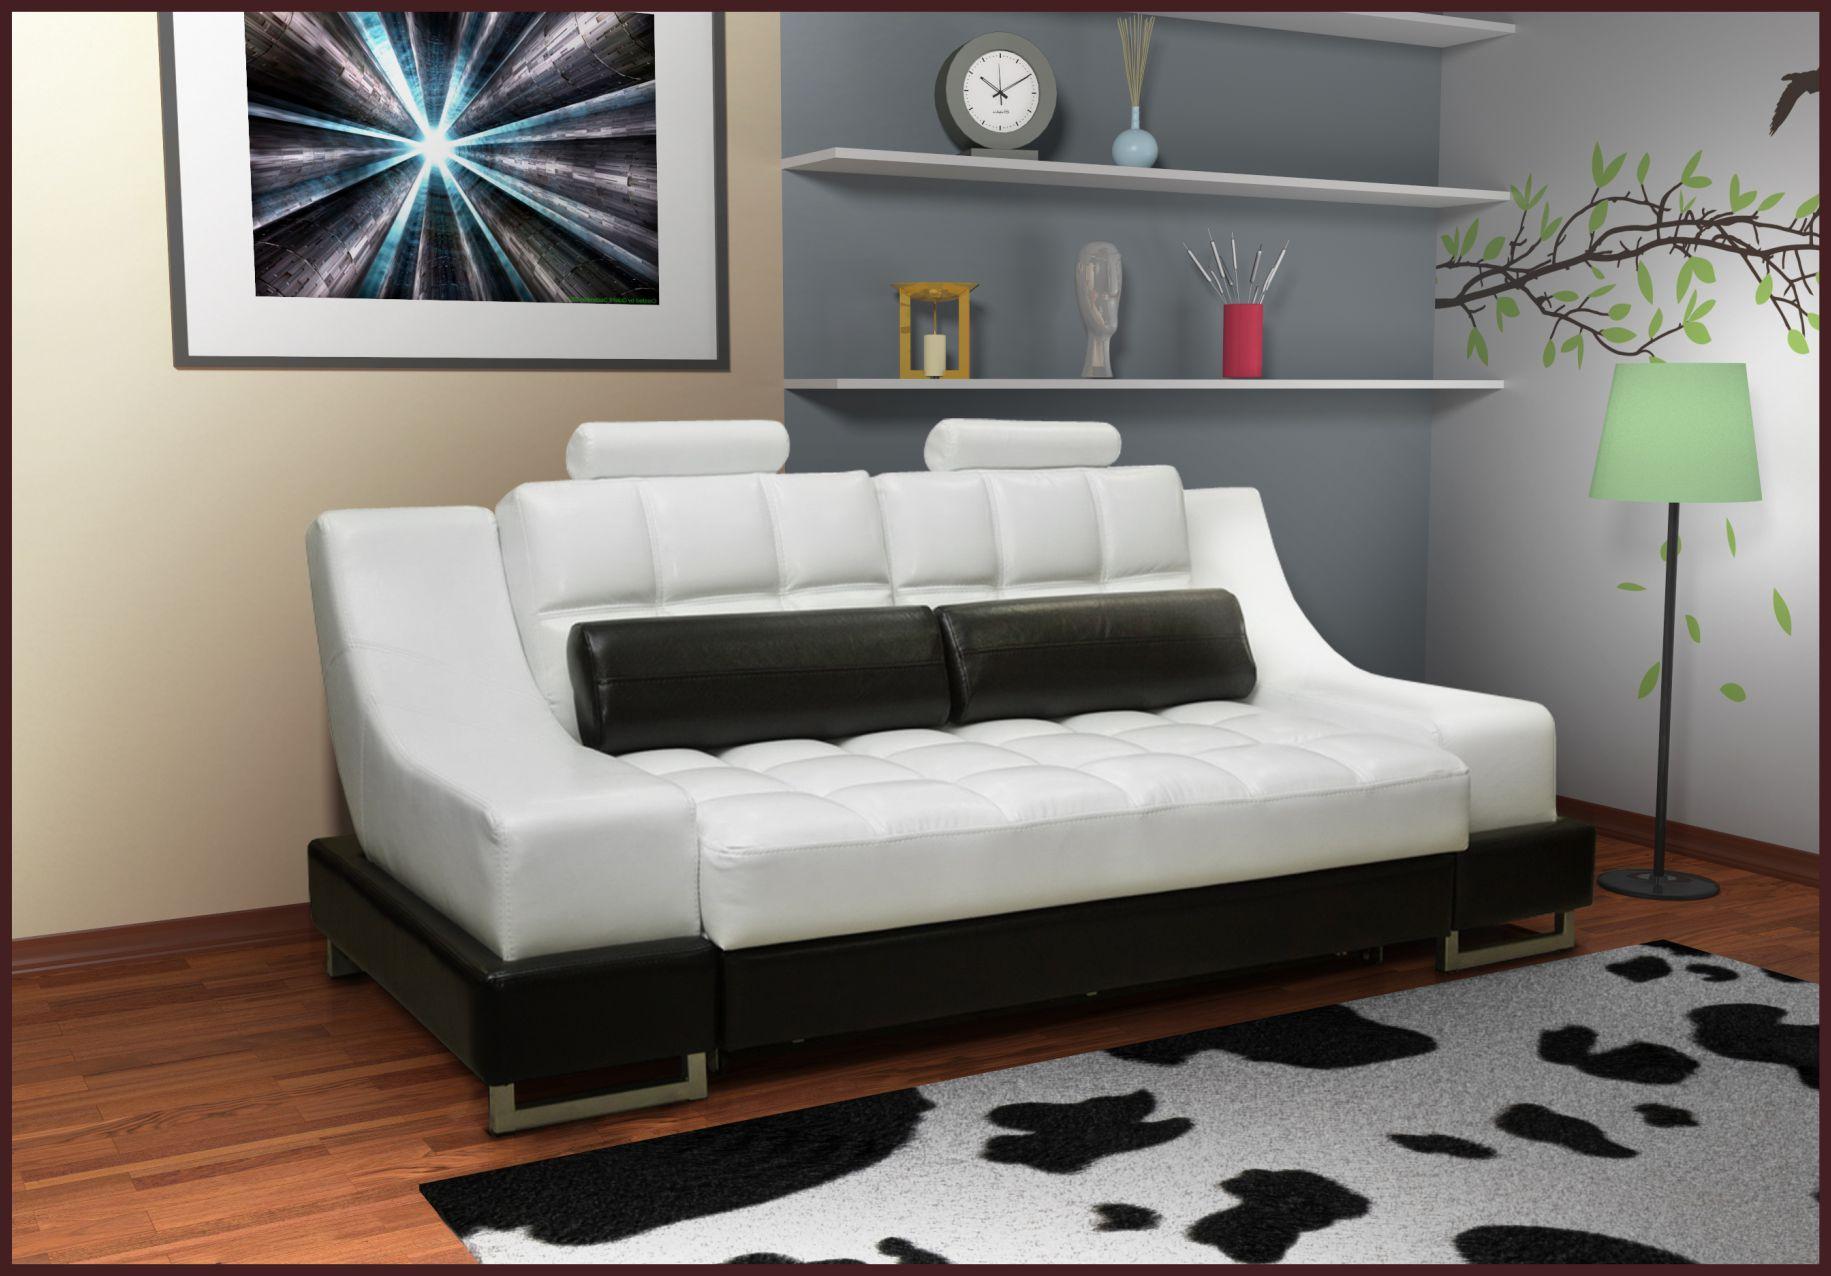 Мягкая мебель официальный сайт каталог цены смоленск